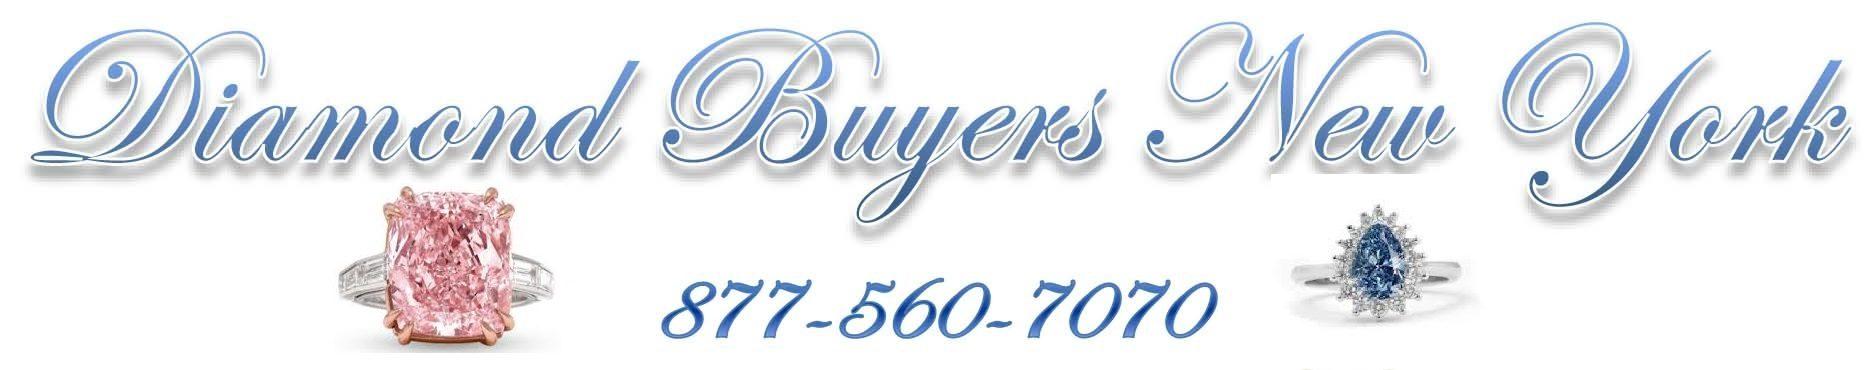 Diamond Buyers New York.